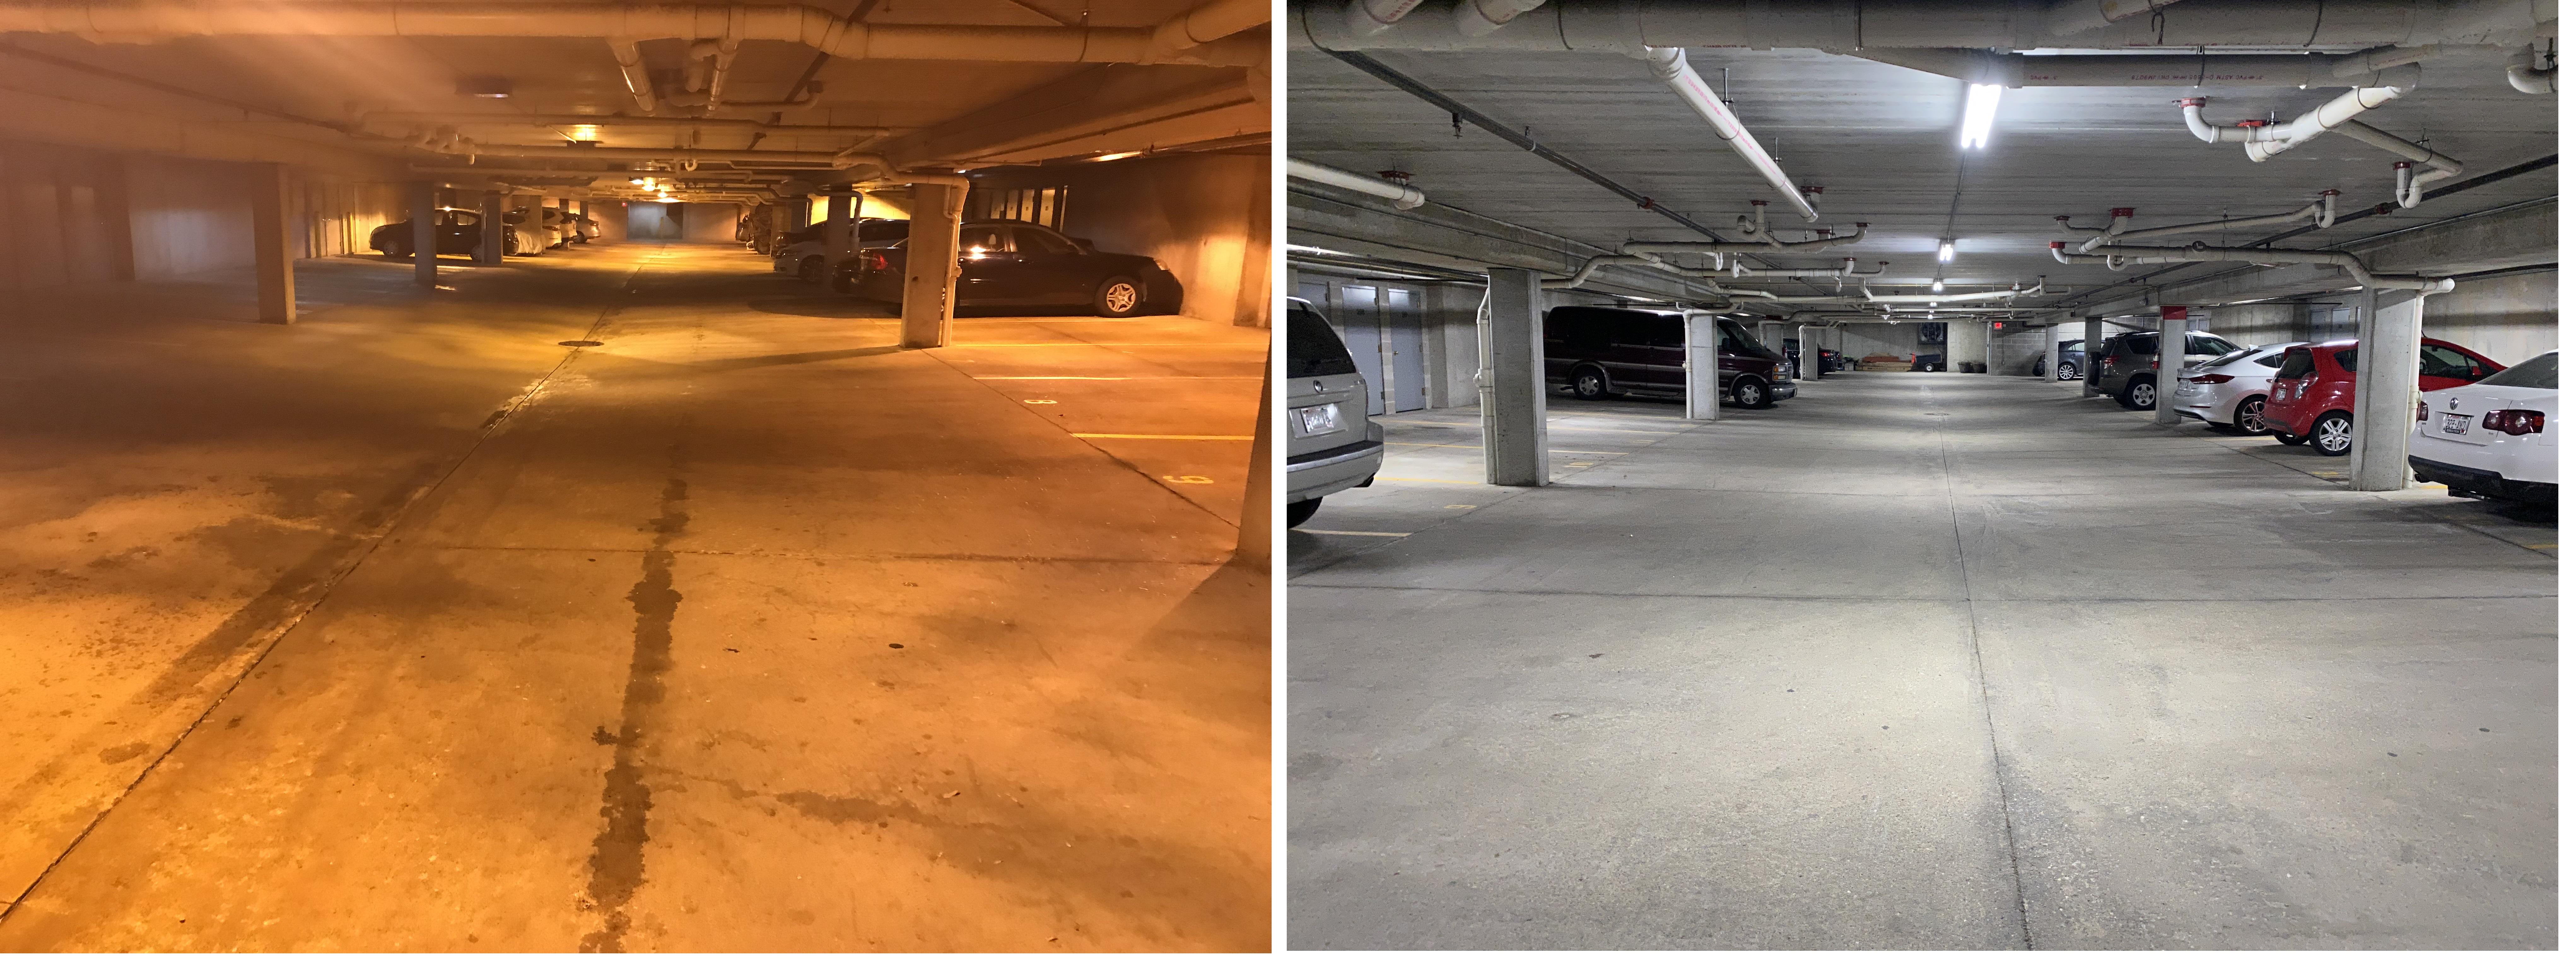 LED garage fixtures